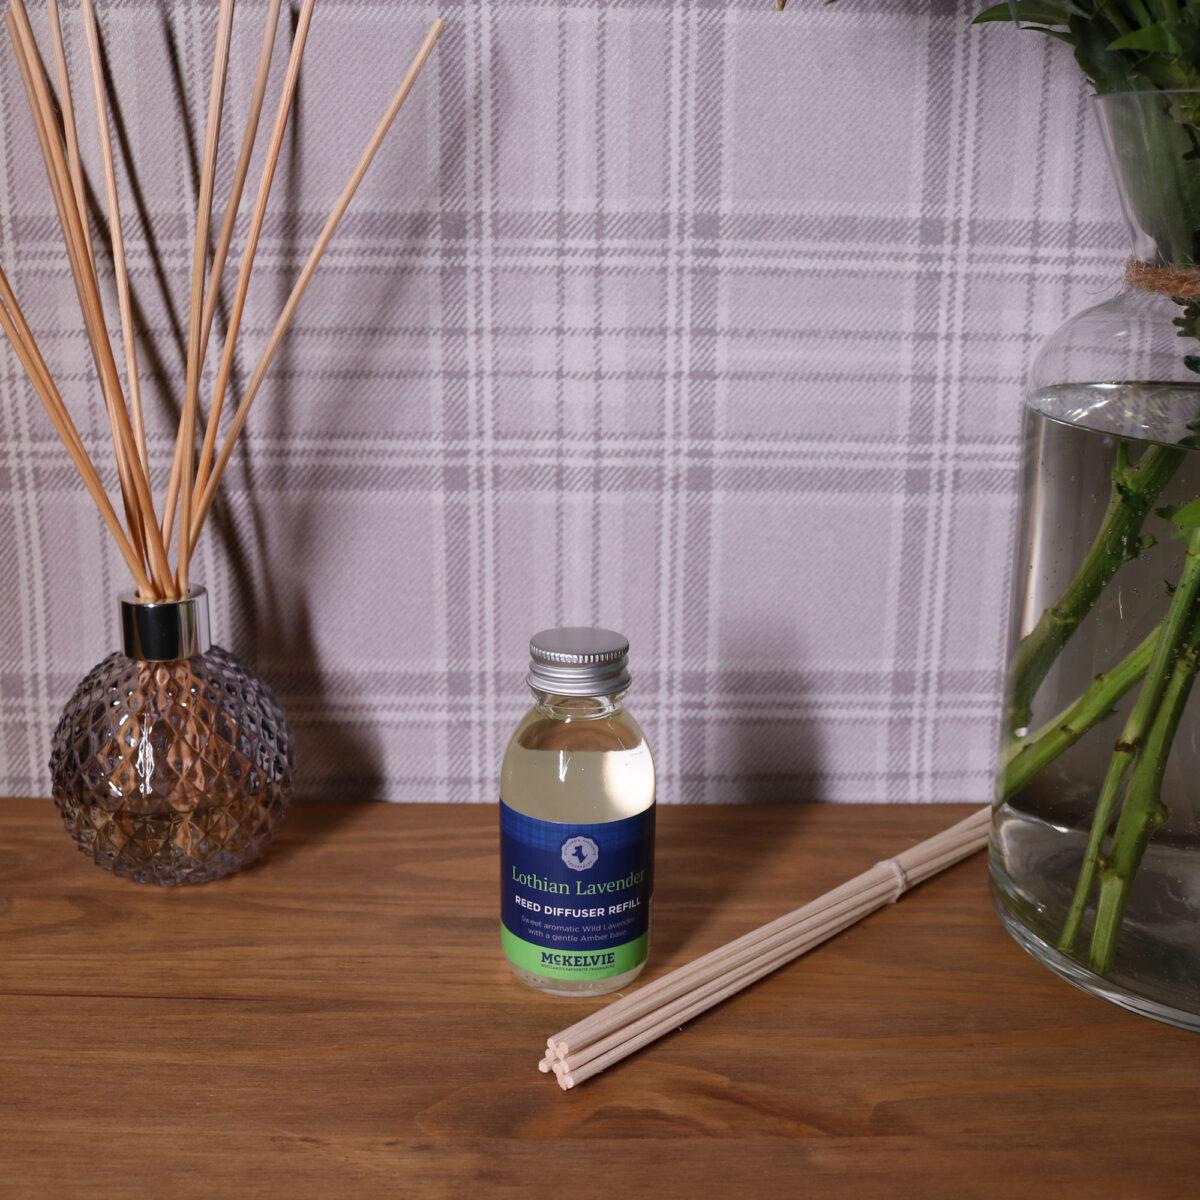 Lothian Lavender Reed Diffuser Refill